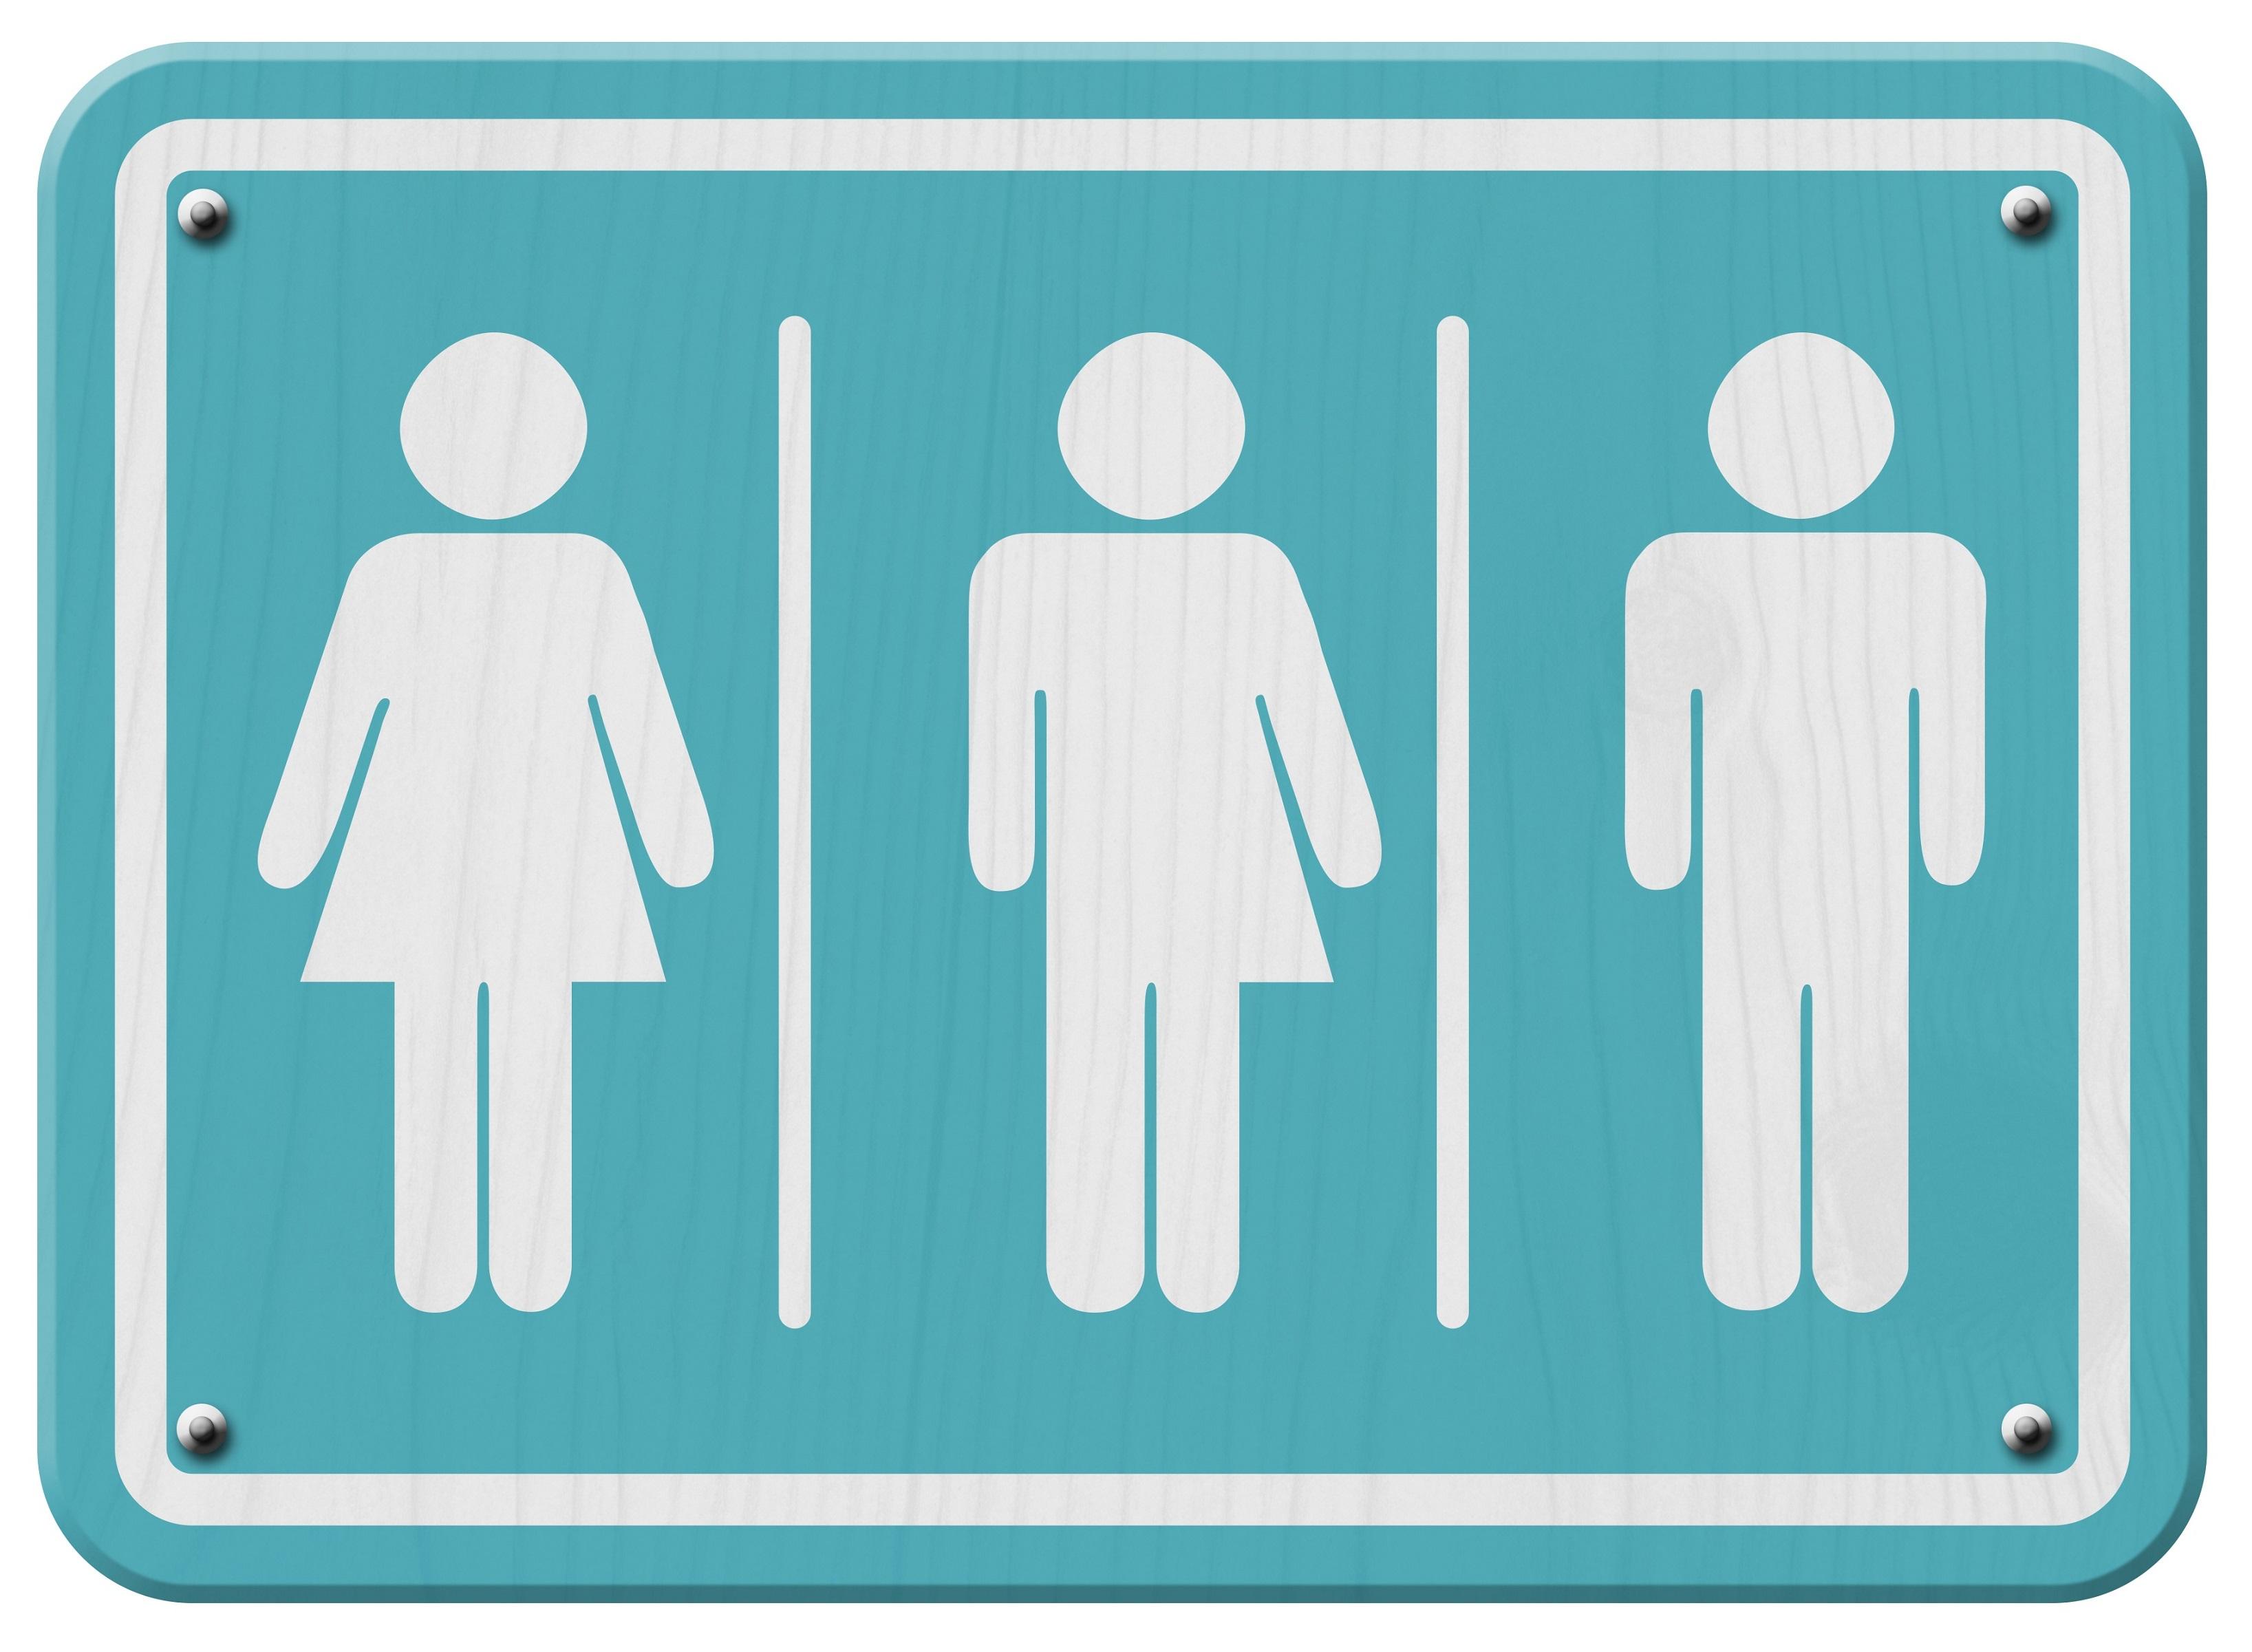 Transgender Bathroom Bill What Should Be Done